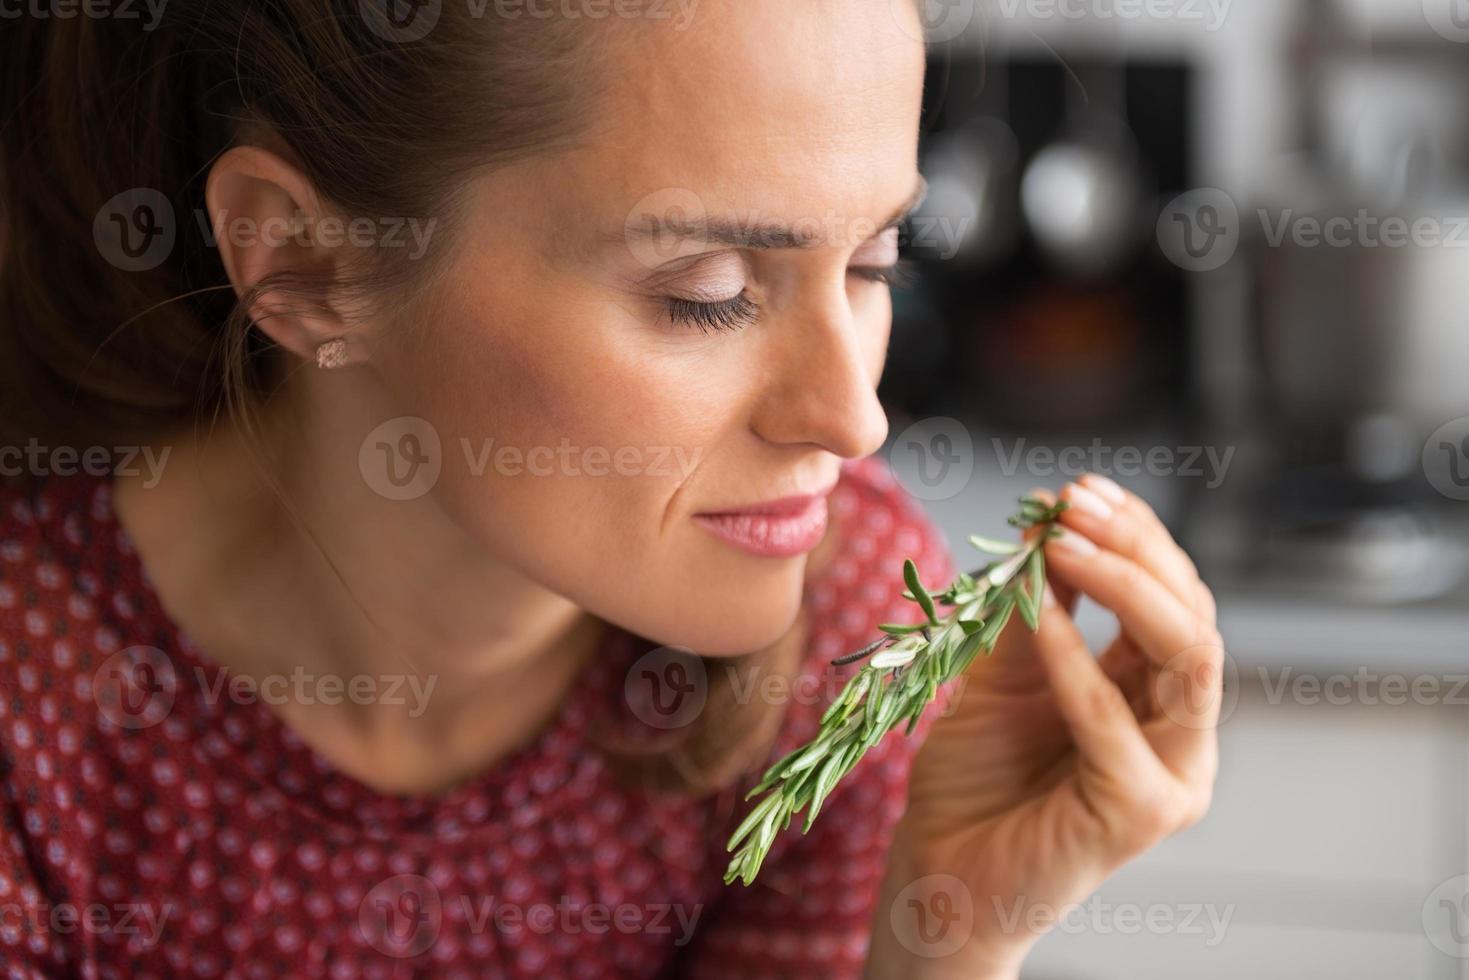 jeune femme au foyer bénéficiant de rosmarinus frais photo